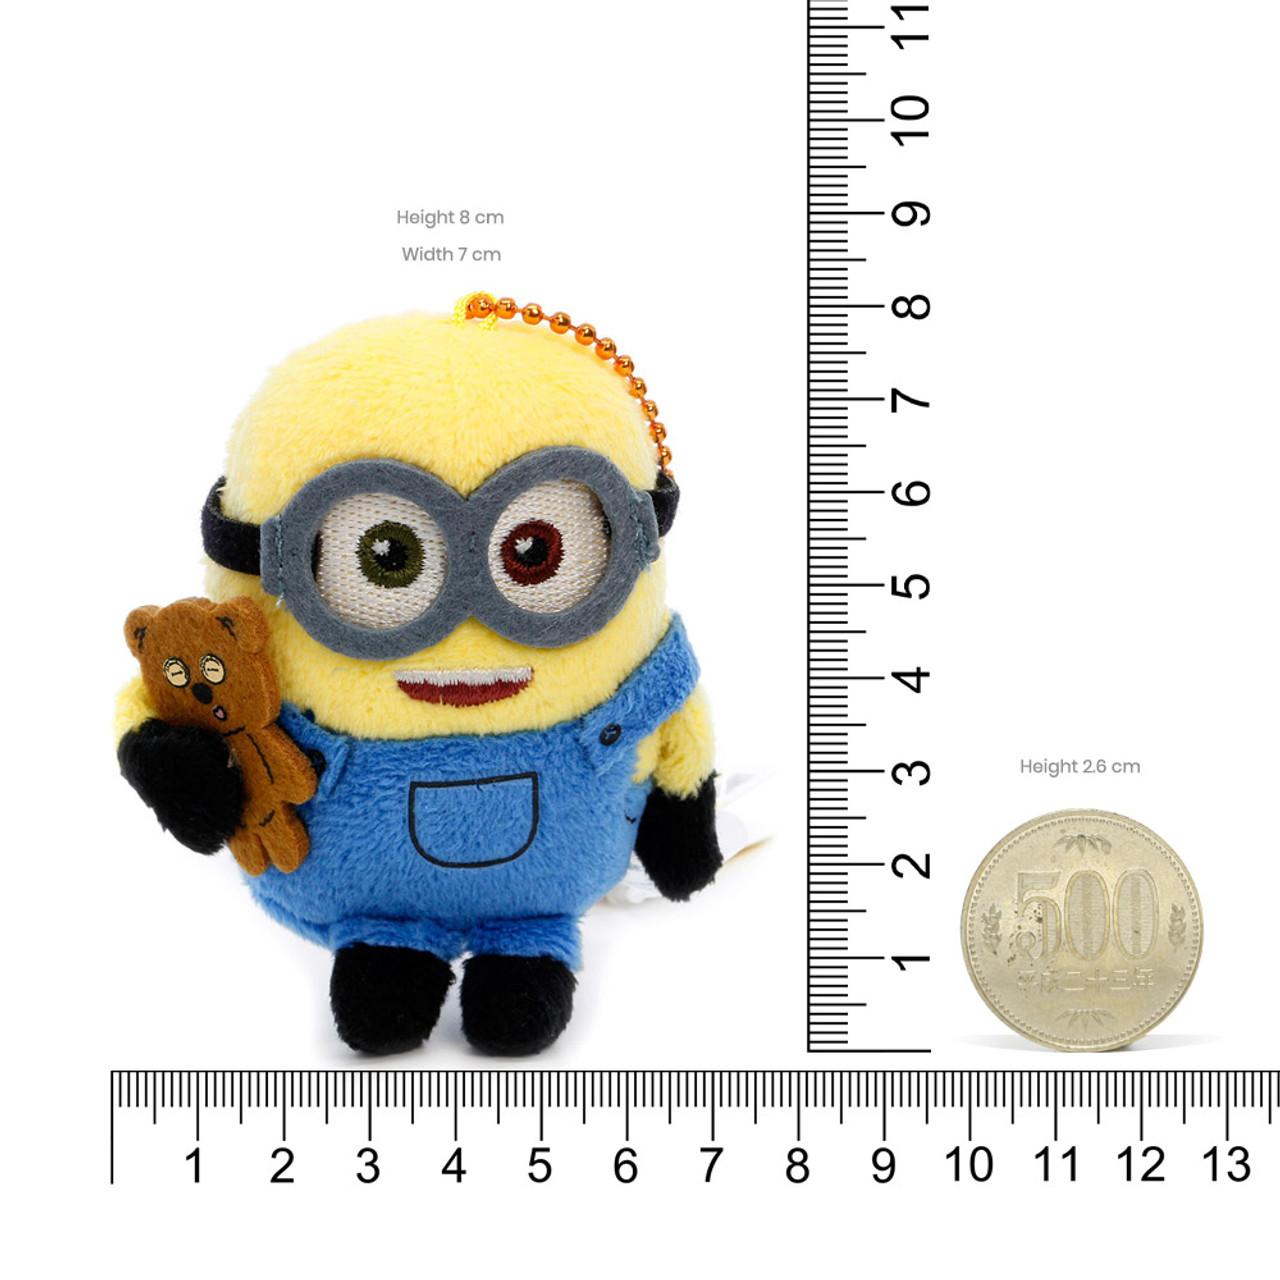 Bob The Minions Mascot Plush Doll Charms ( Proportion )